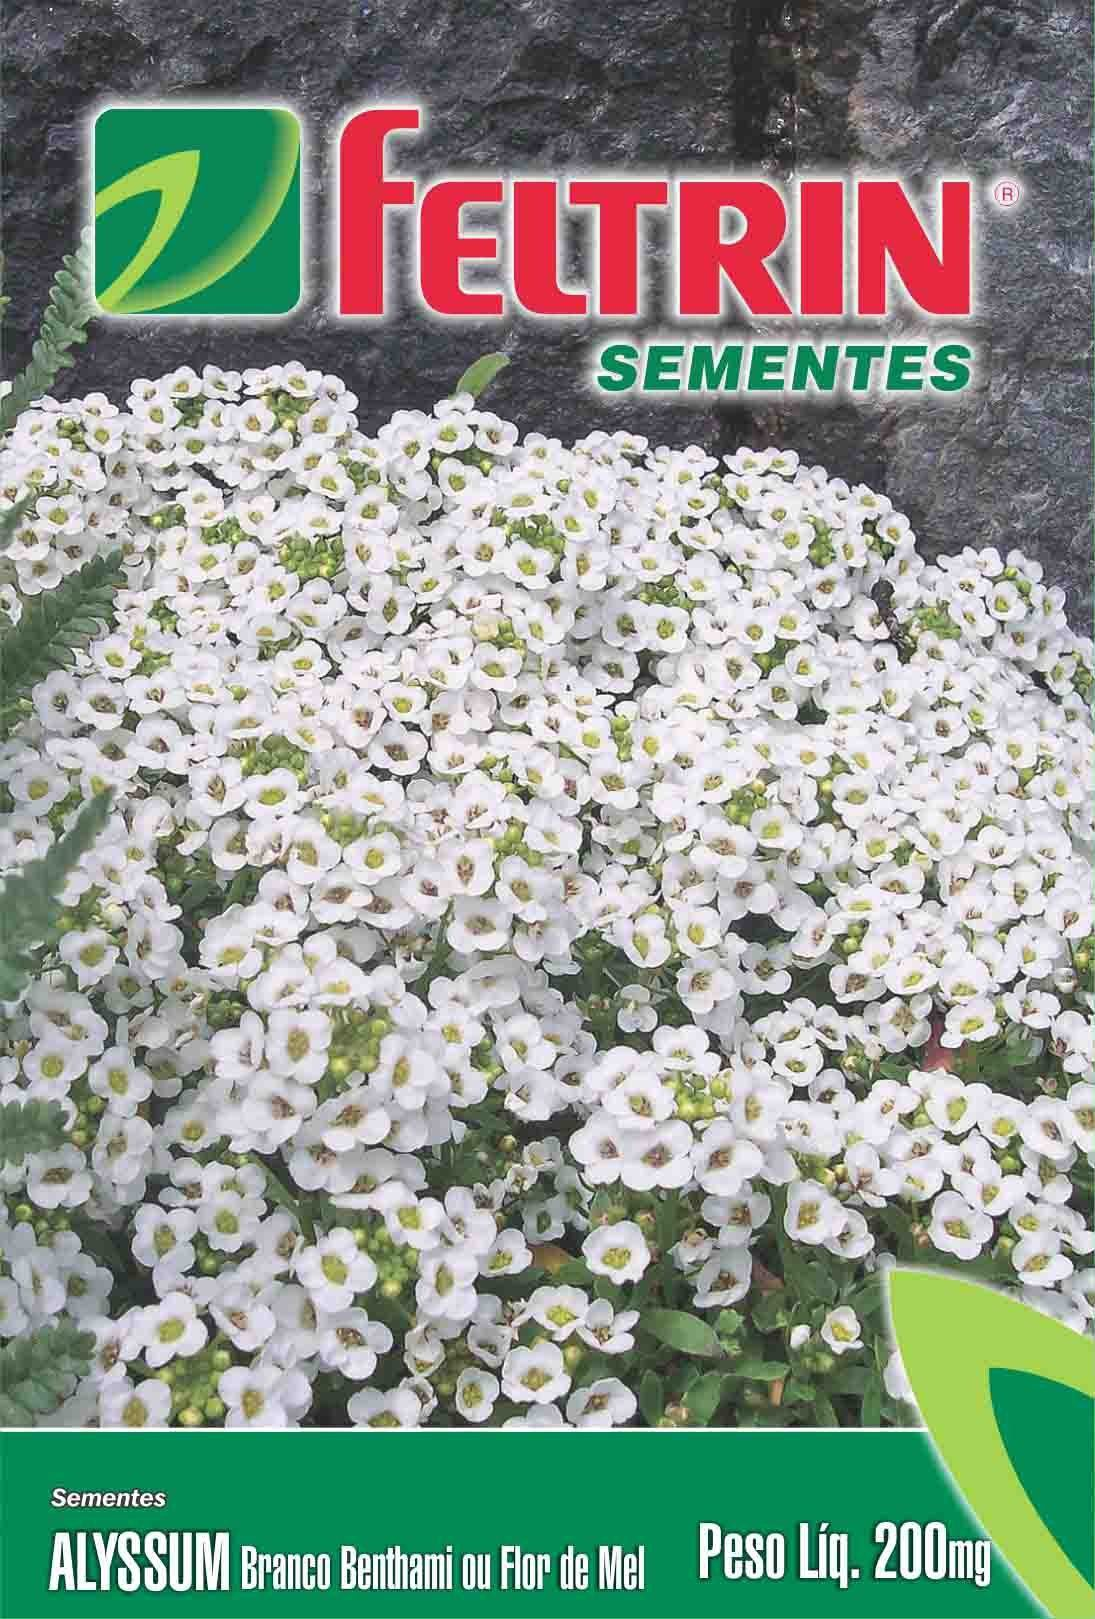 Sementes de Alyssum Branco Benthami Flor de Mel - Feltrin Linha Flores Econômica 200mg